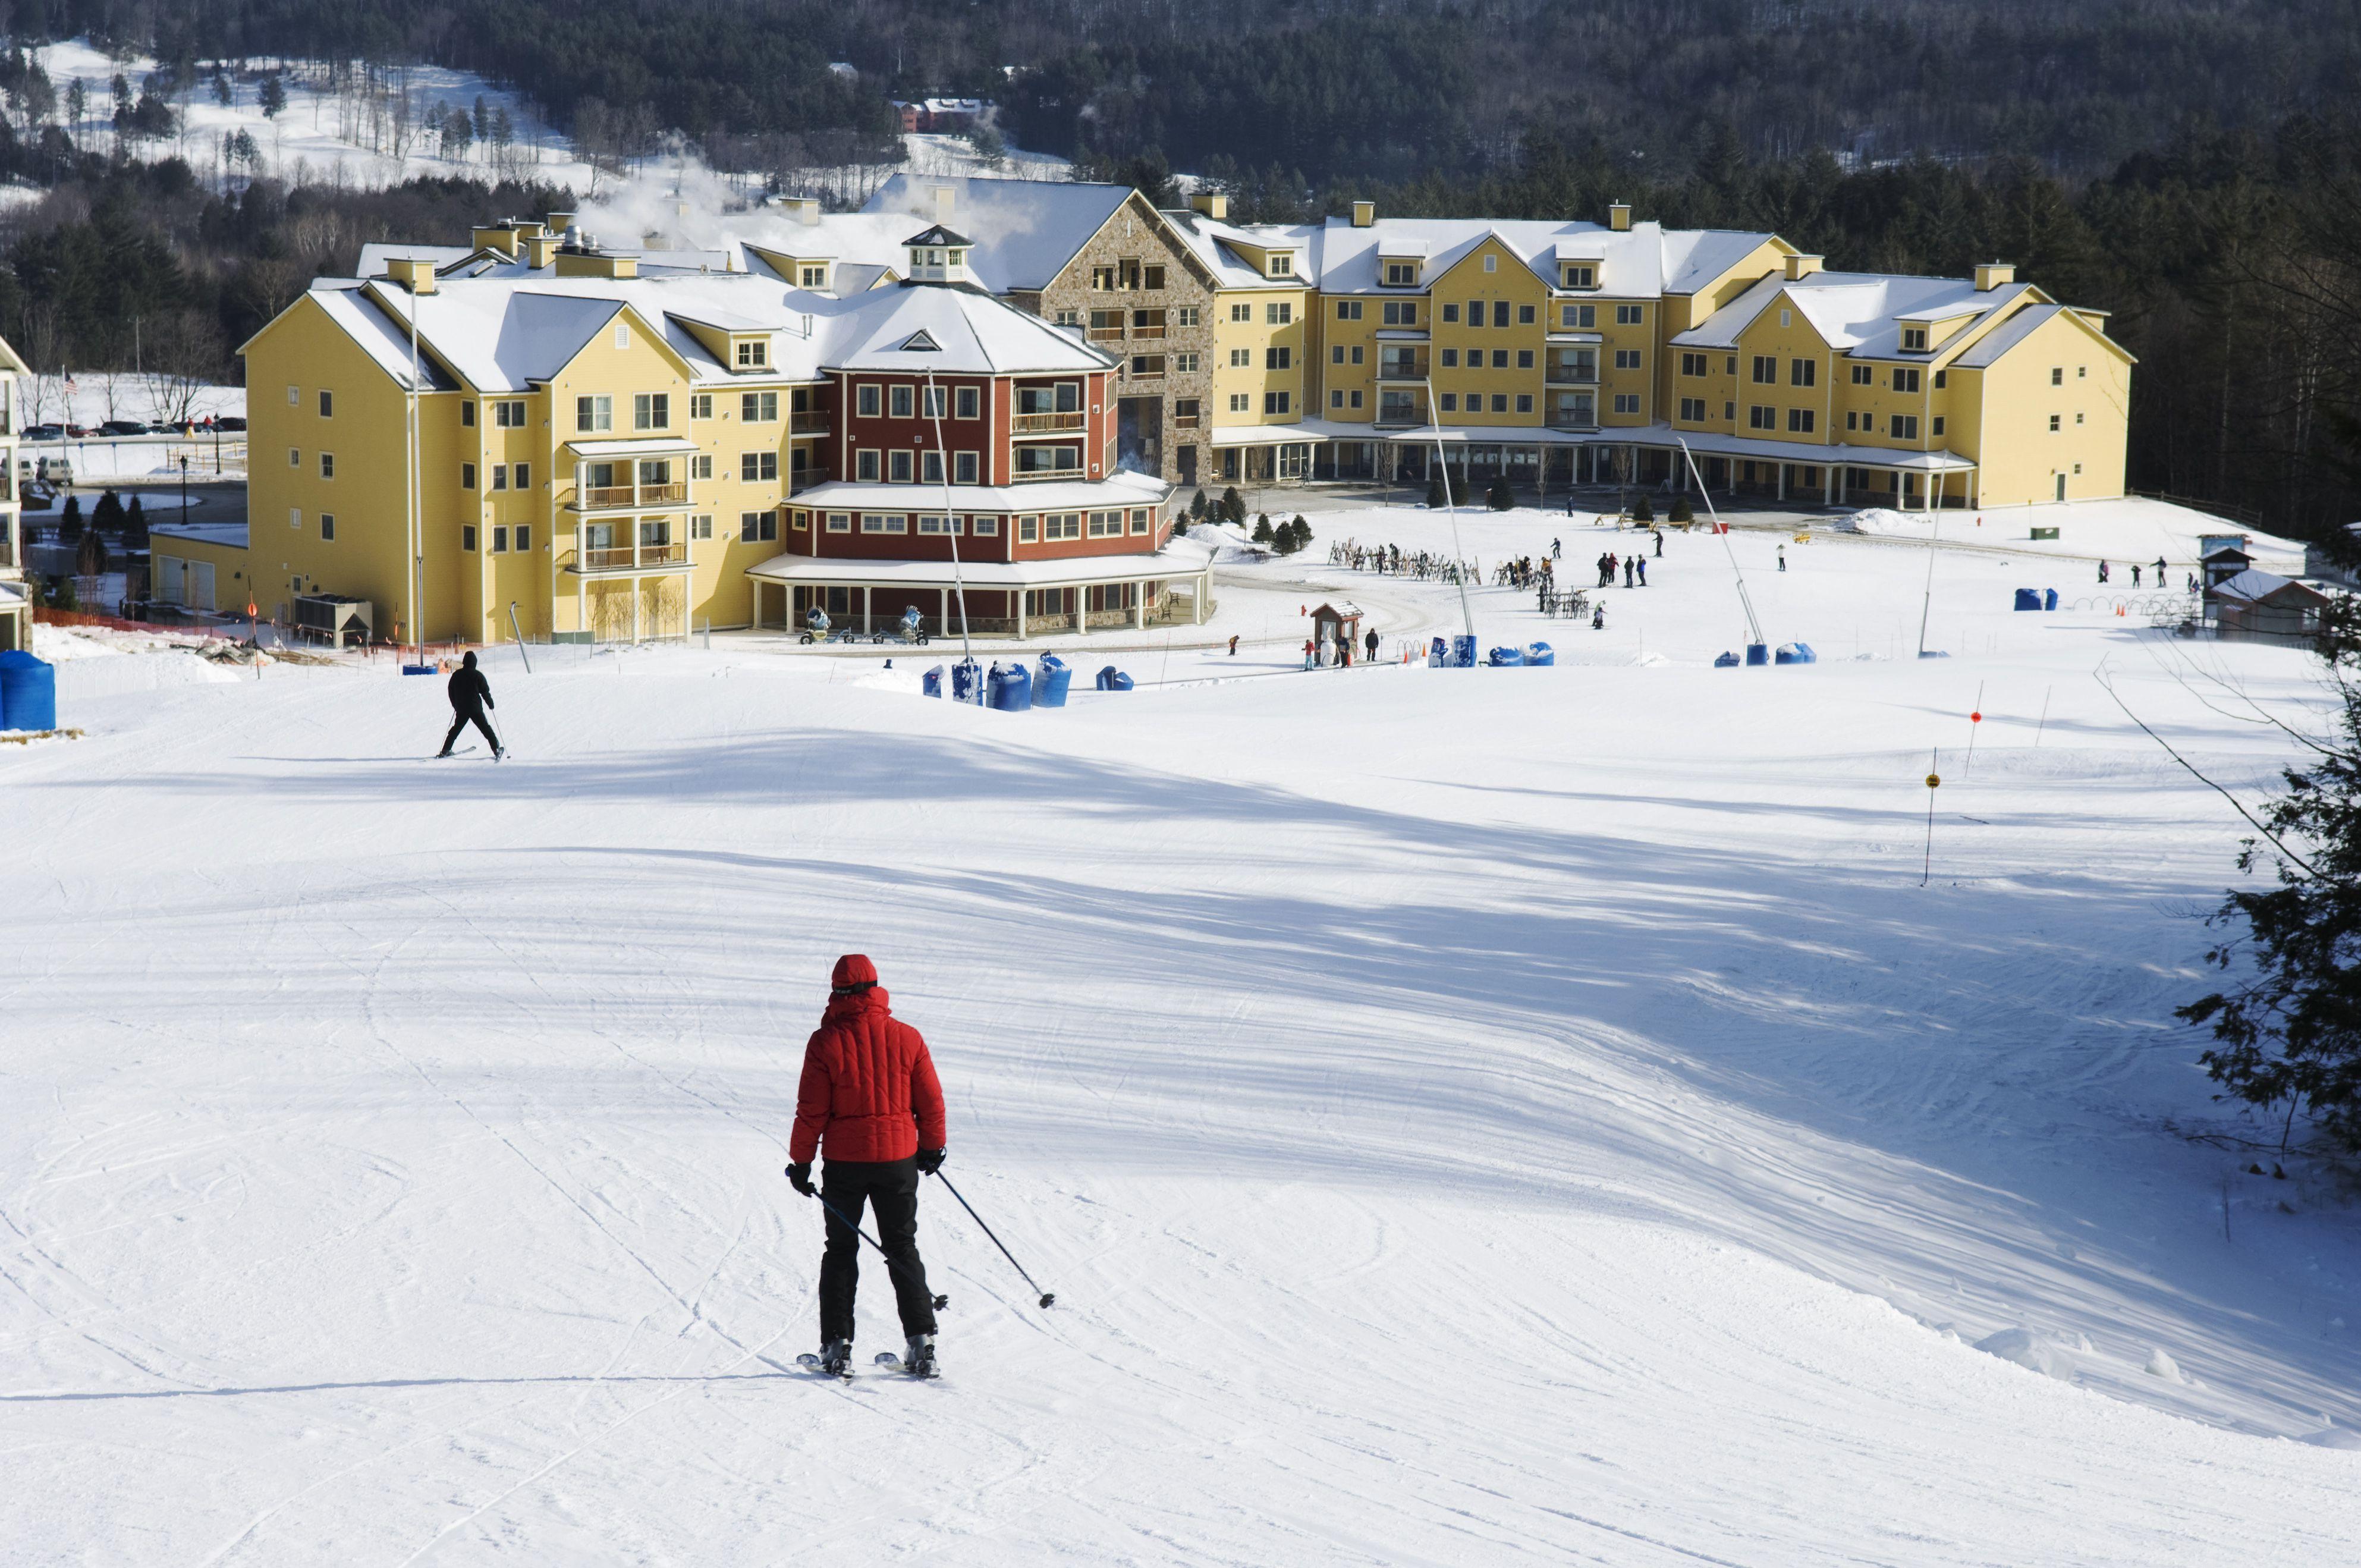 Skier heading back to the Okemo Ski resort, Okemo Valley